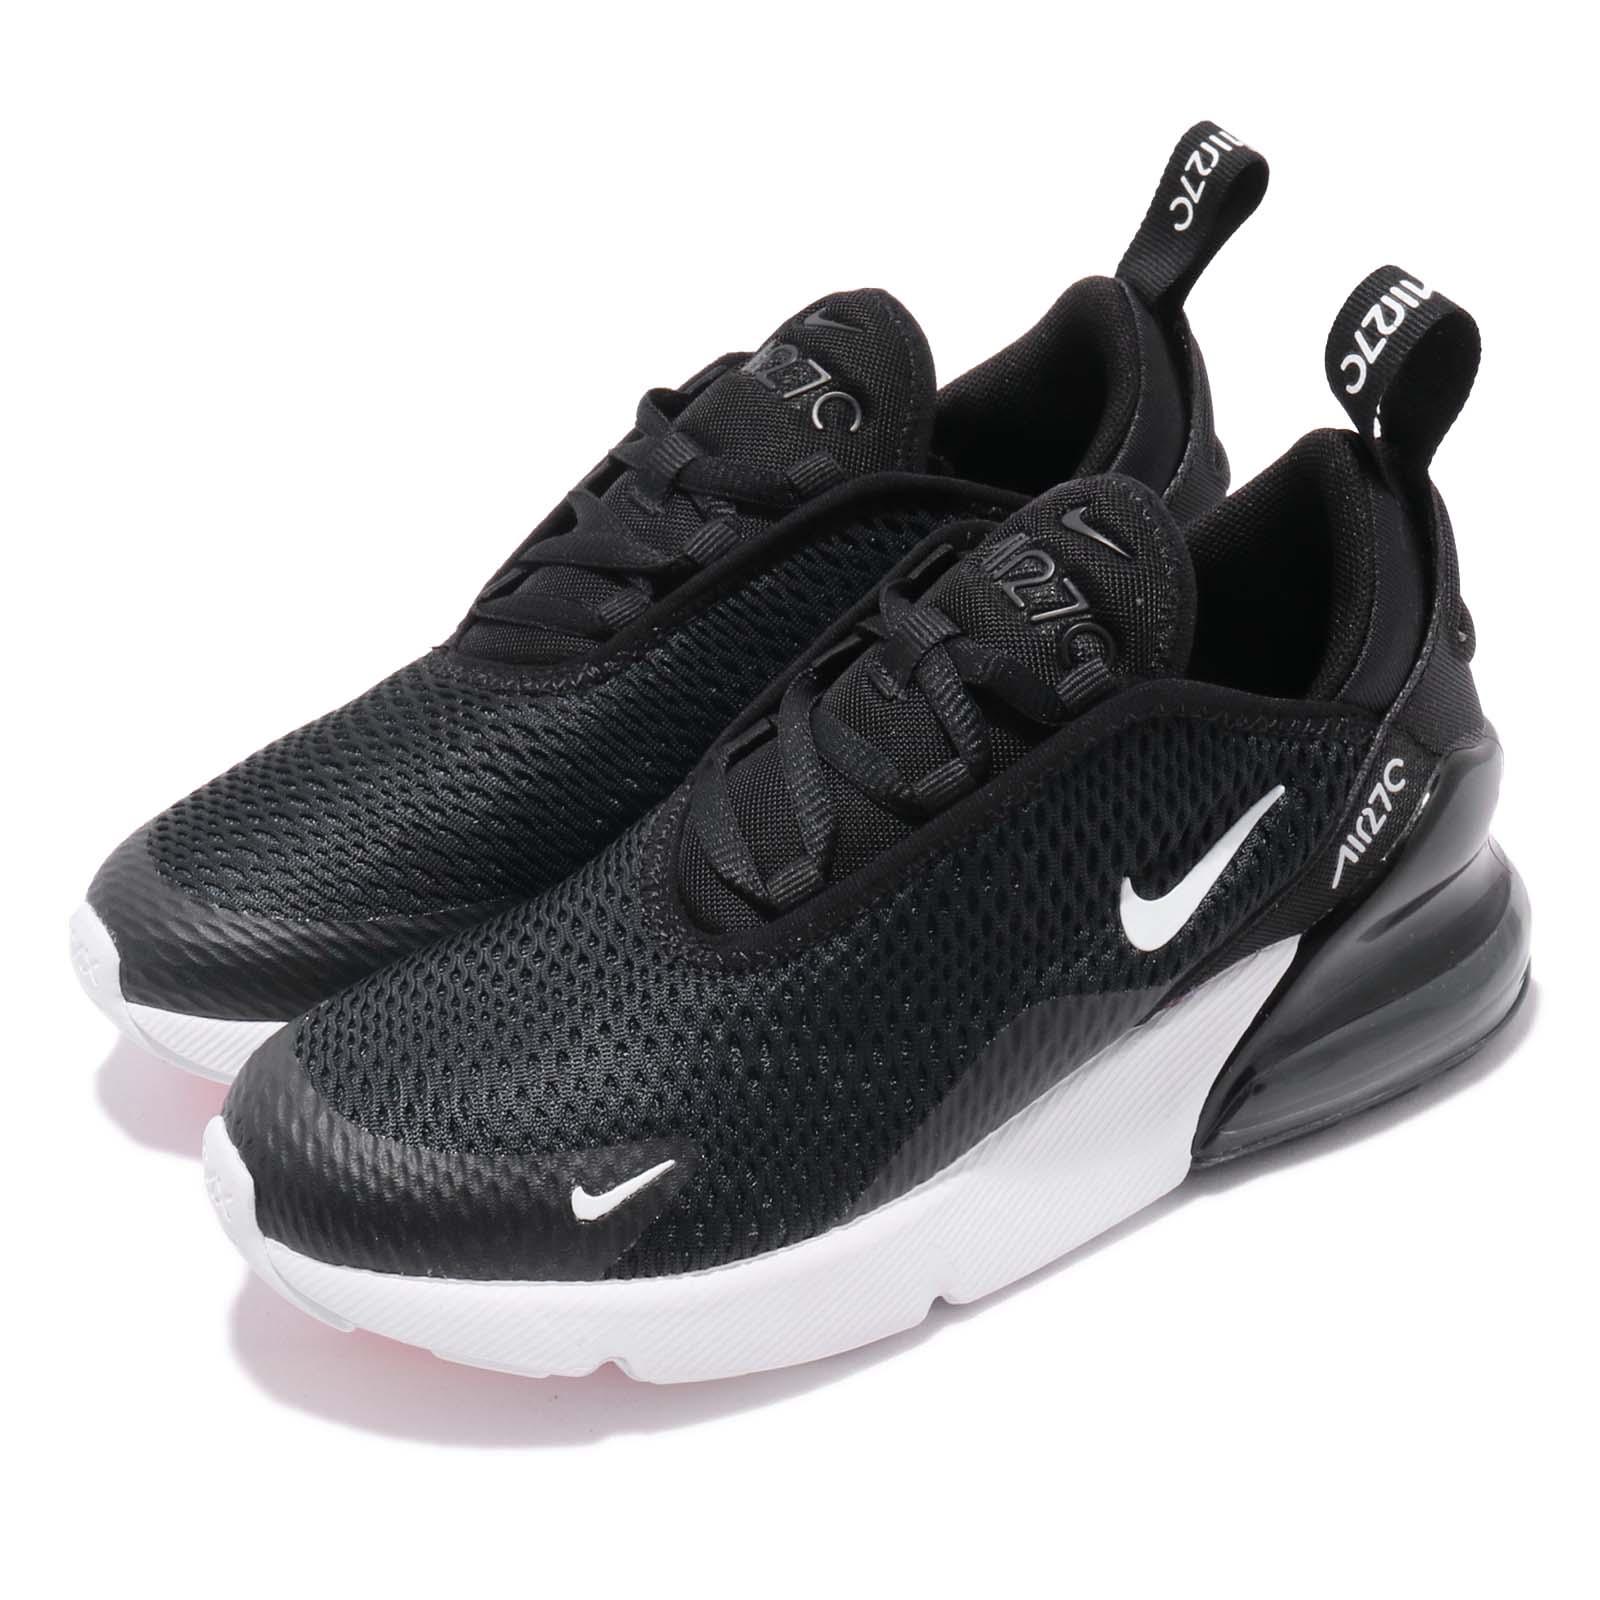 Nike 休閒鞋 Air Max 270 童鞋 AO2372-001